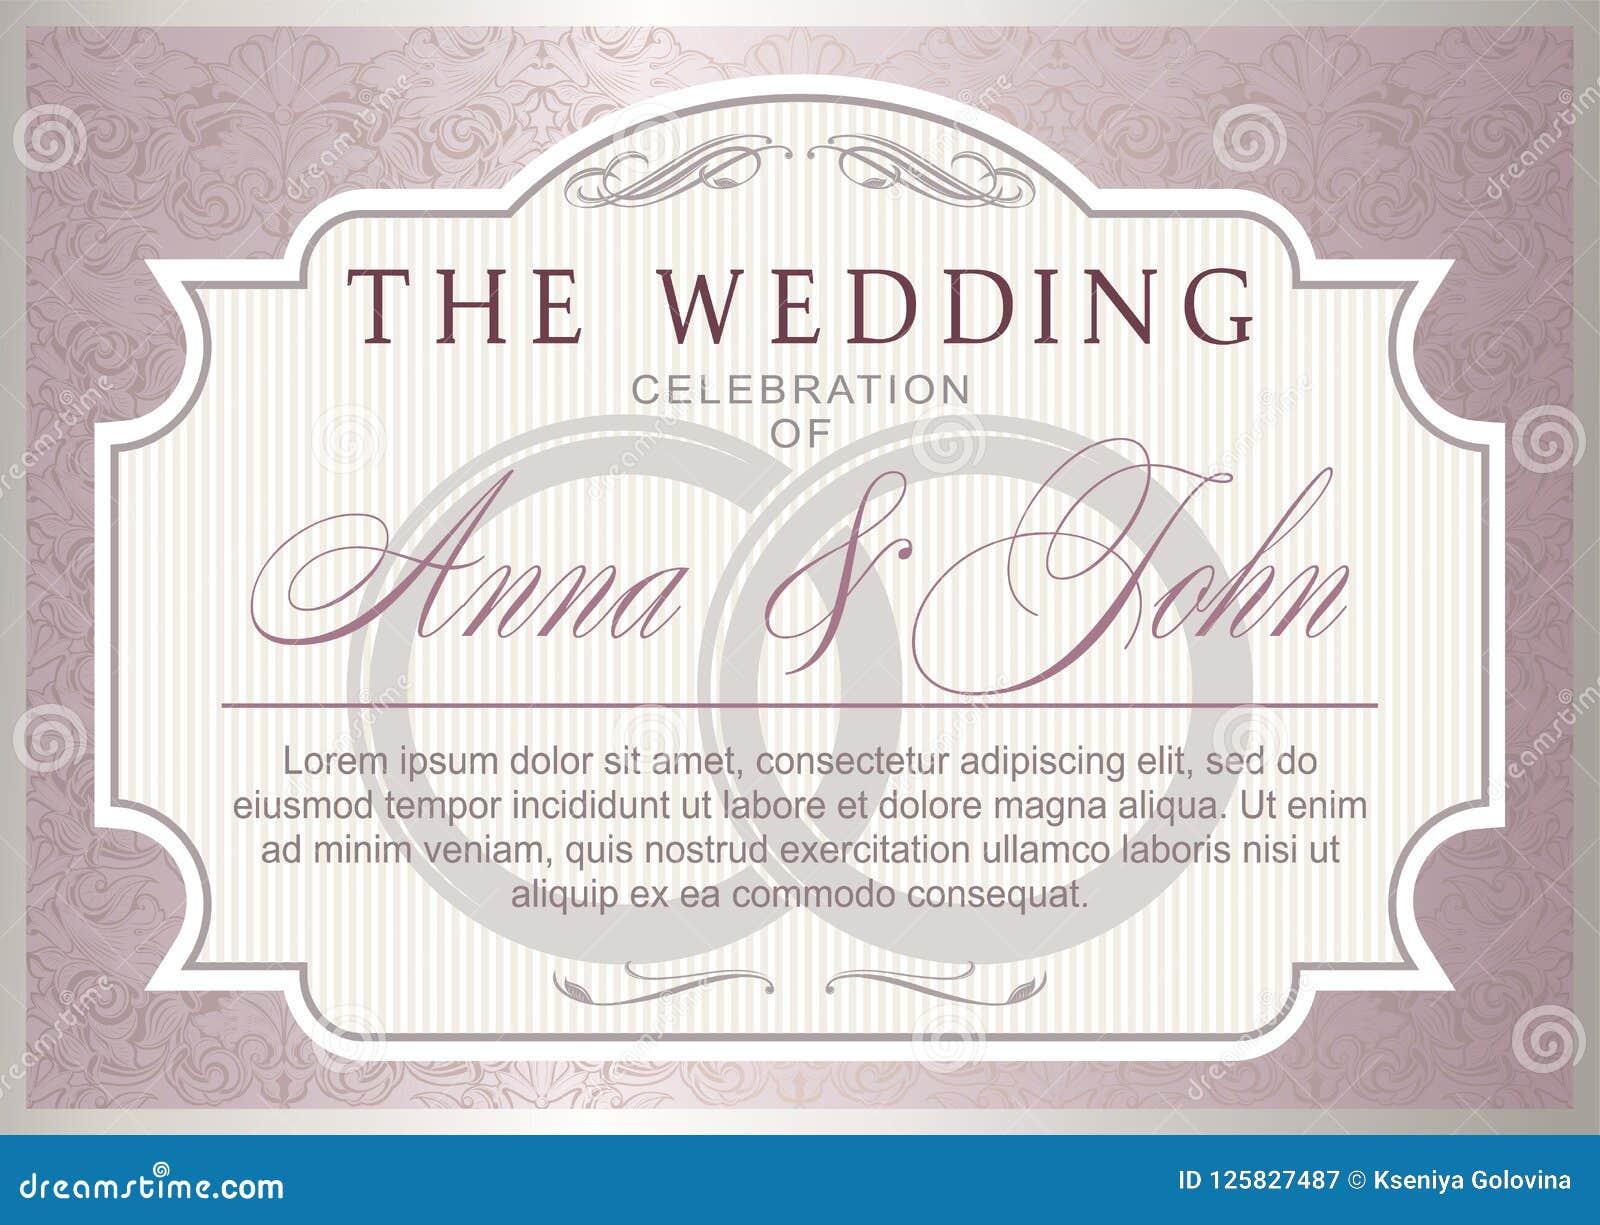 Vintage Wedding Invitation Template Stock Vector Illustration Of